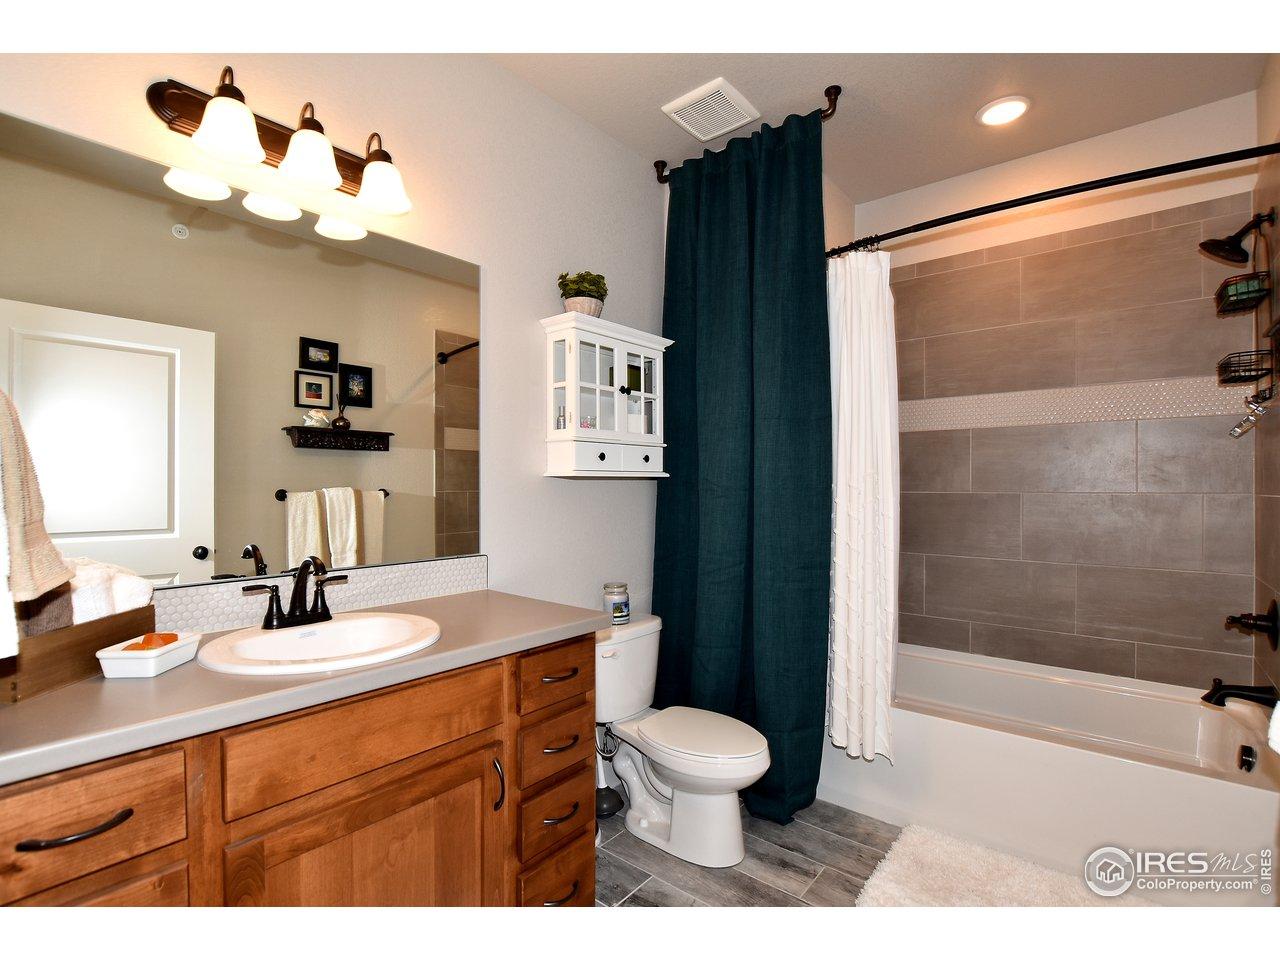 2nd full size bathroom